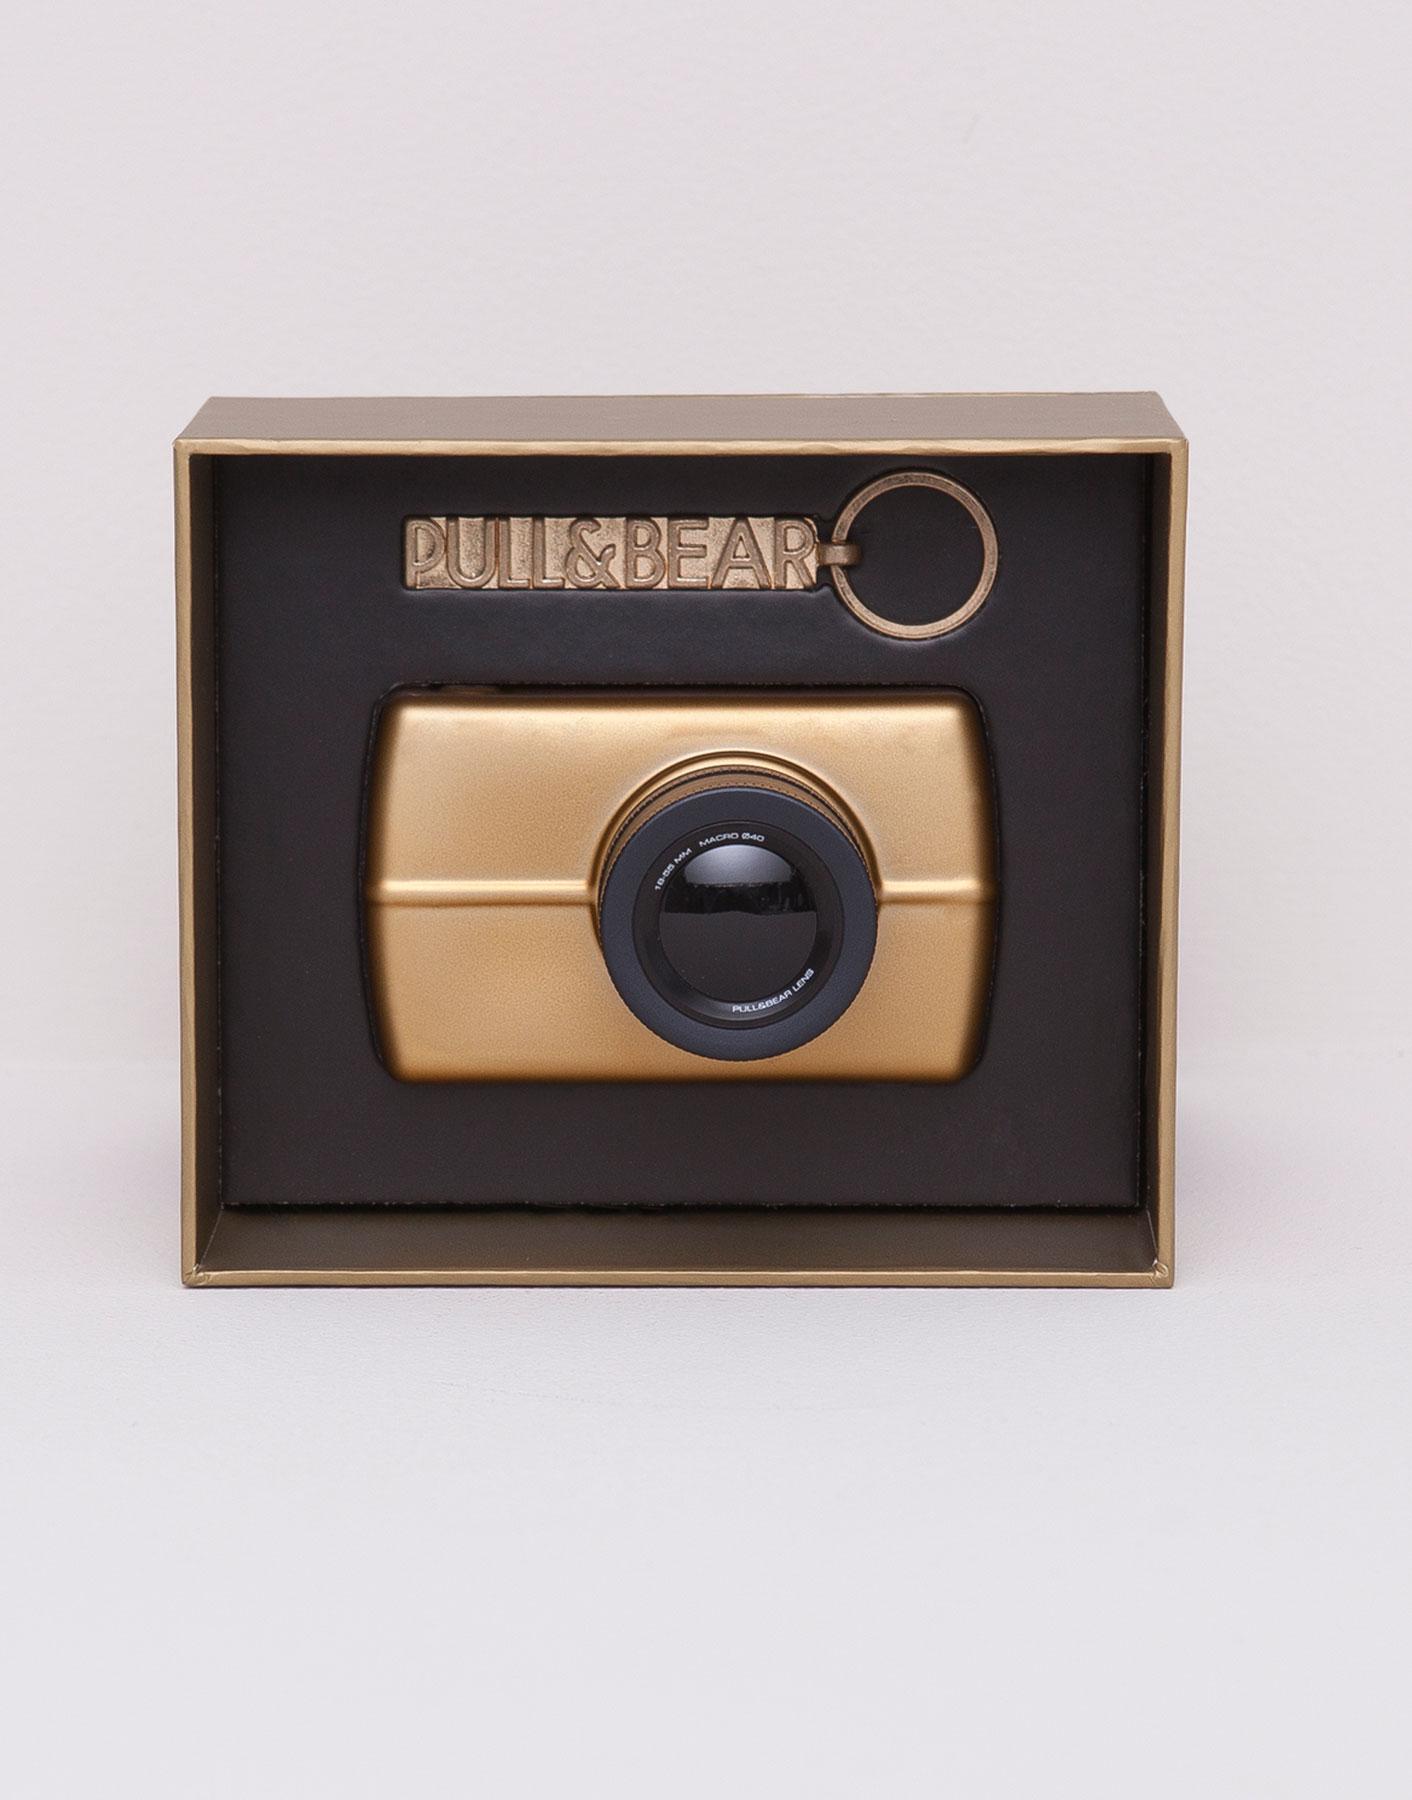 Pull & bear shot gold eau de cologne gift case